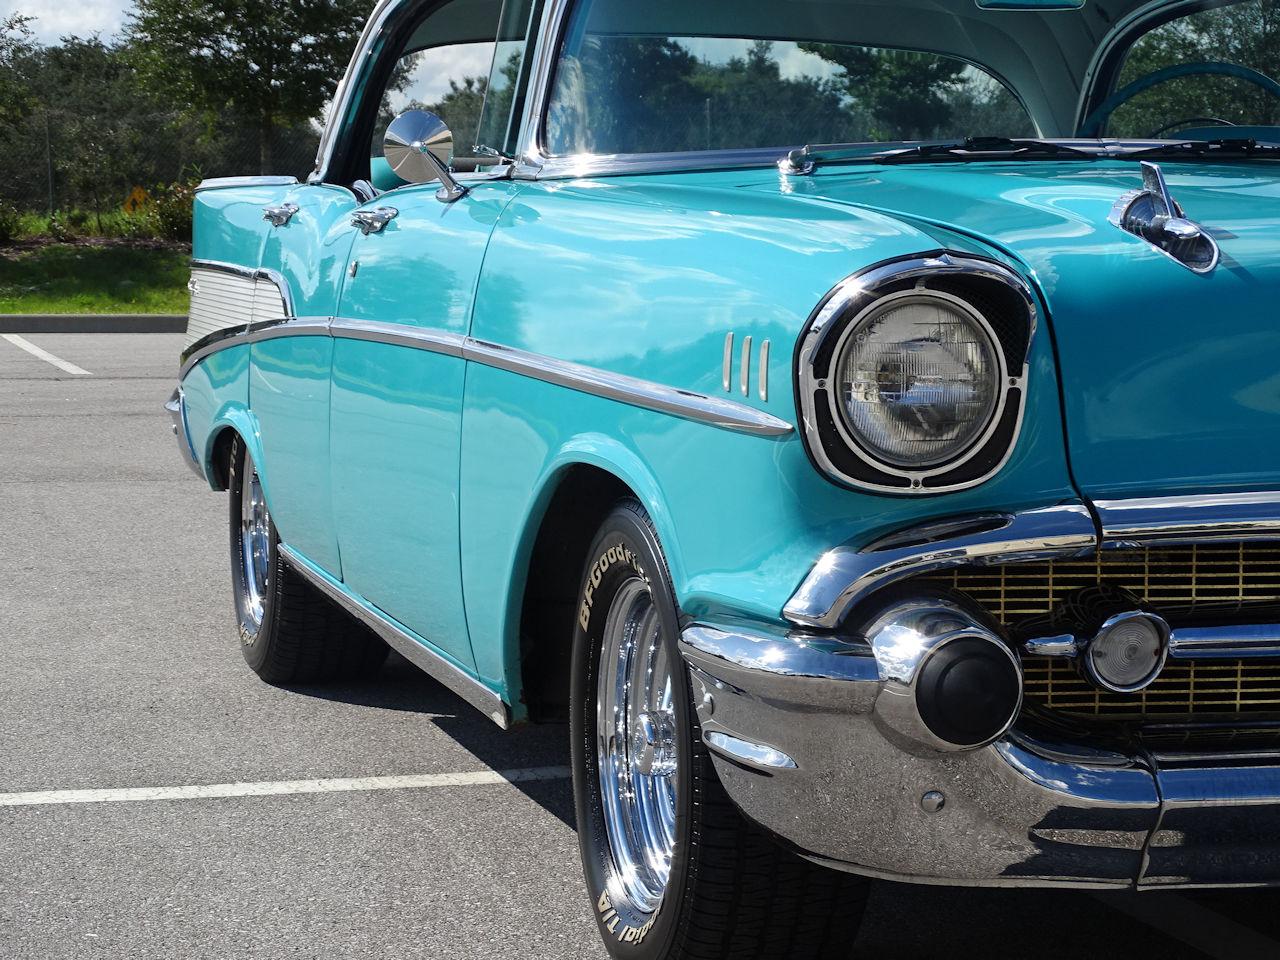 1957 Chevrolet Bel Air 86